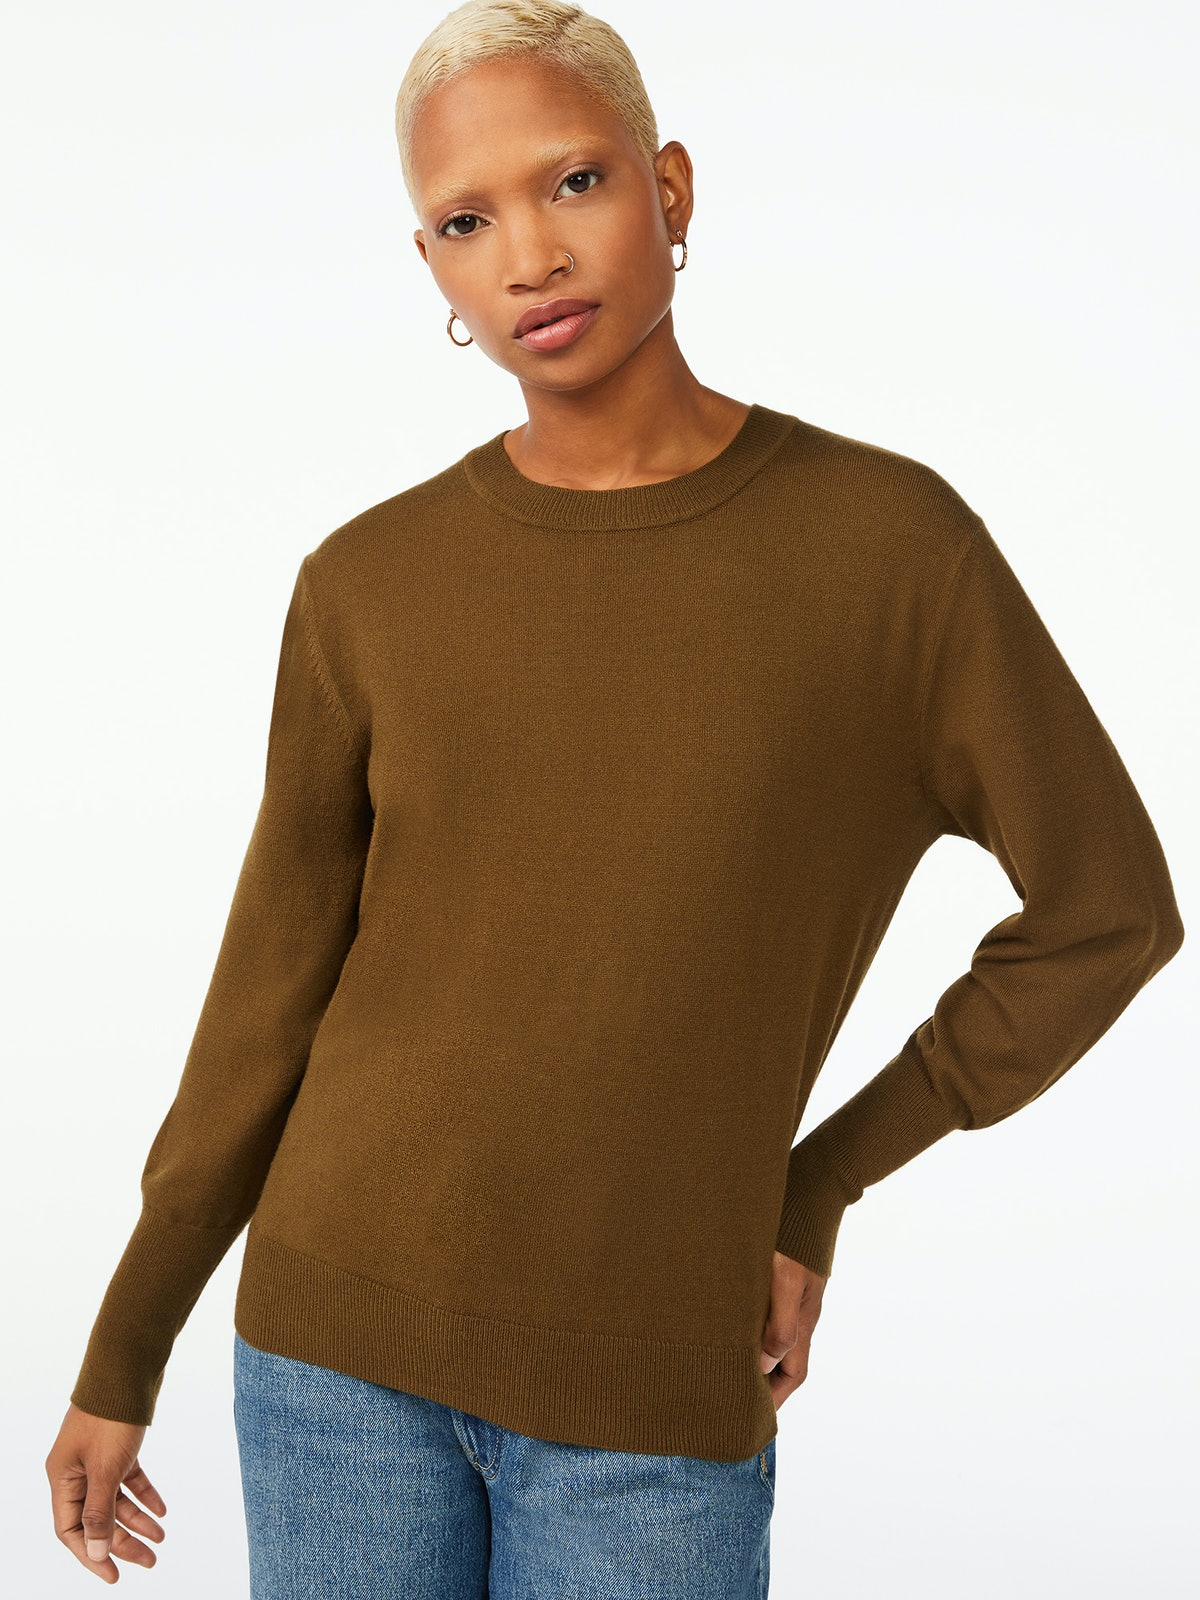 Boxy Cozy Yarn Sweater